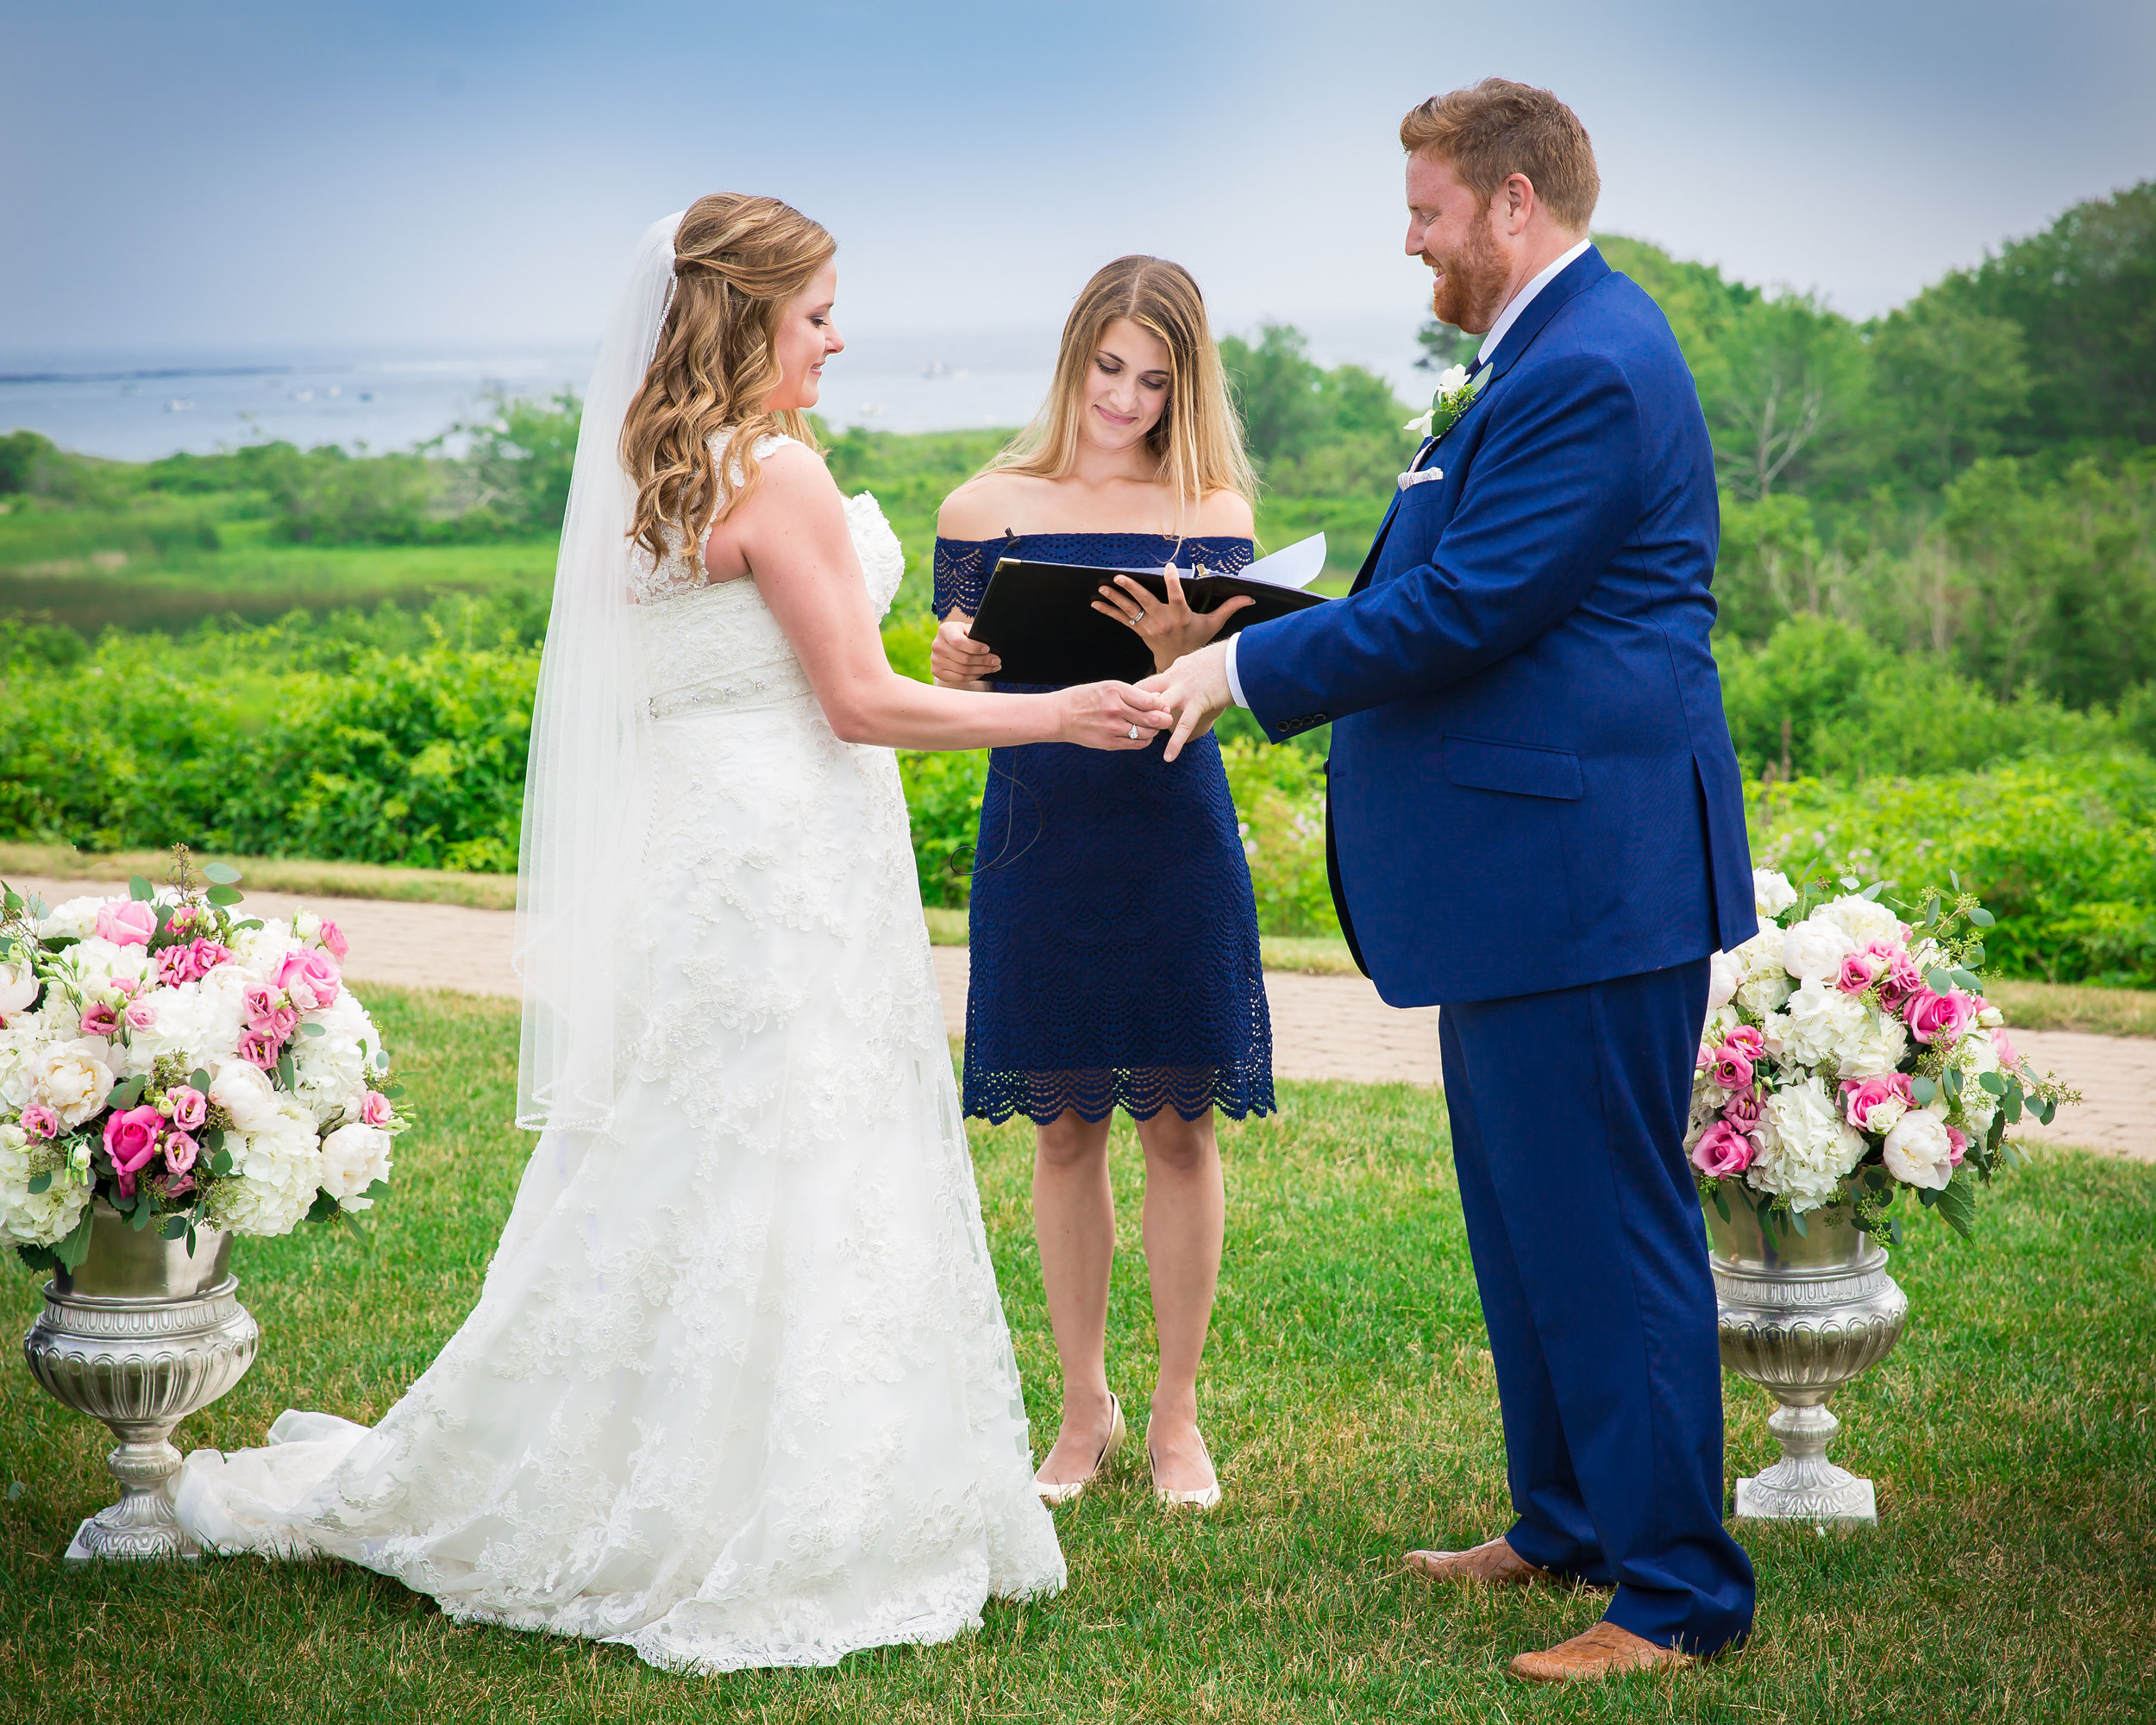 Malloy Weddings | wedding flowers | Maine wedding florist | Inn by the Sea | Cape Elizabeth Maine